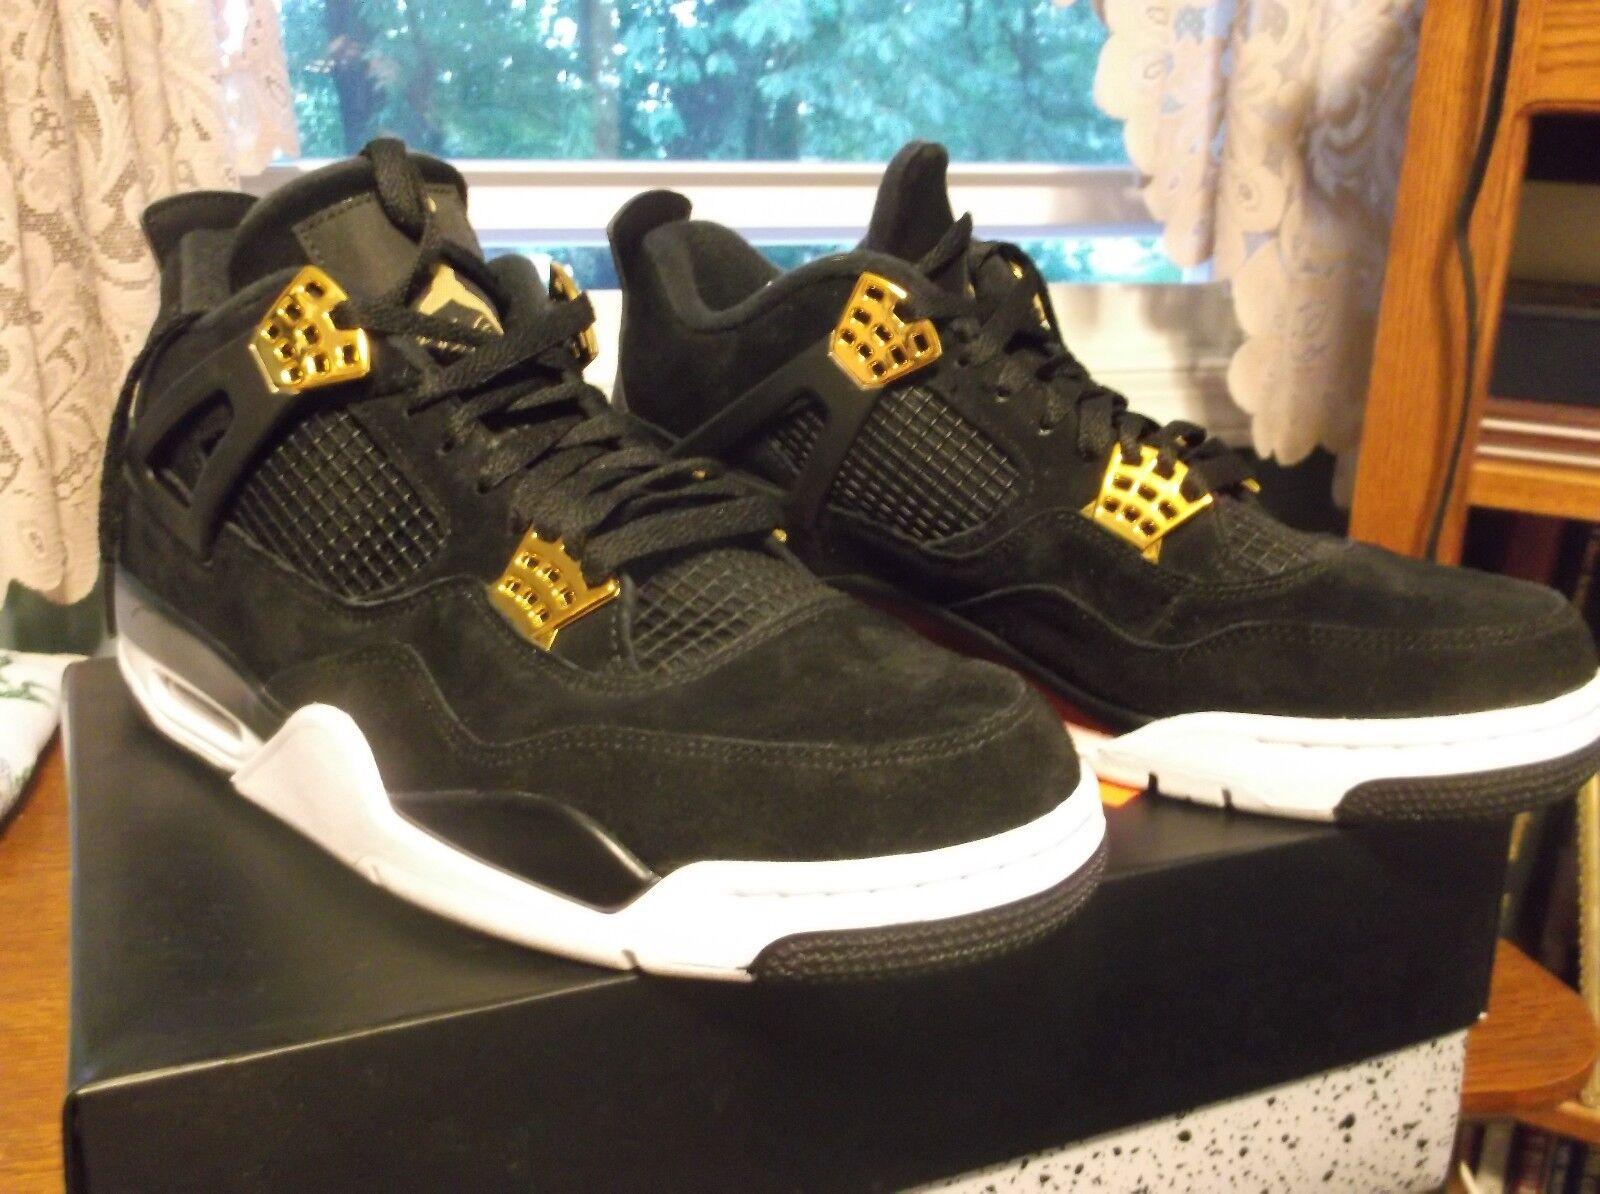 Nike air jordan 4 retro - schwarzes gold mens sz 10,5